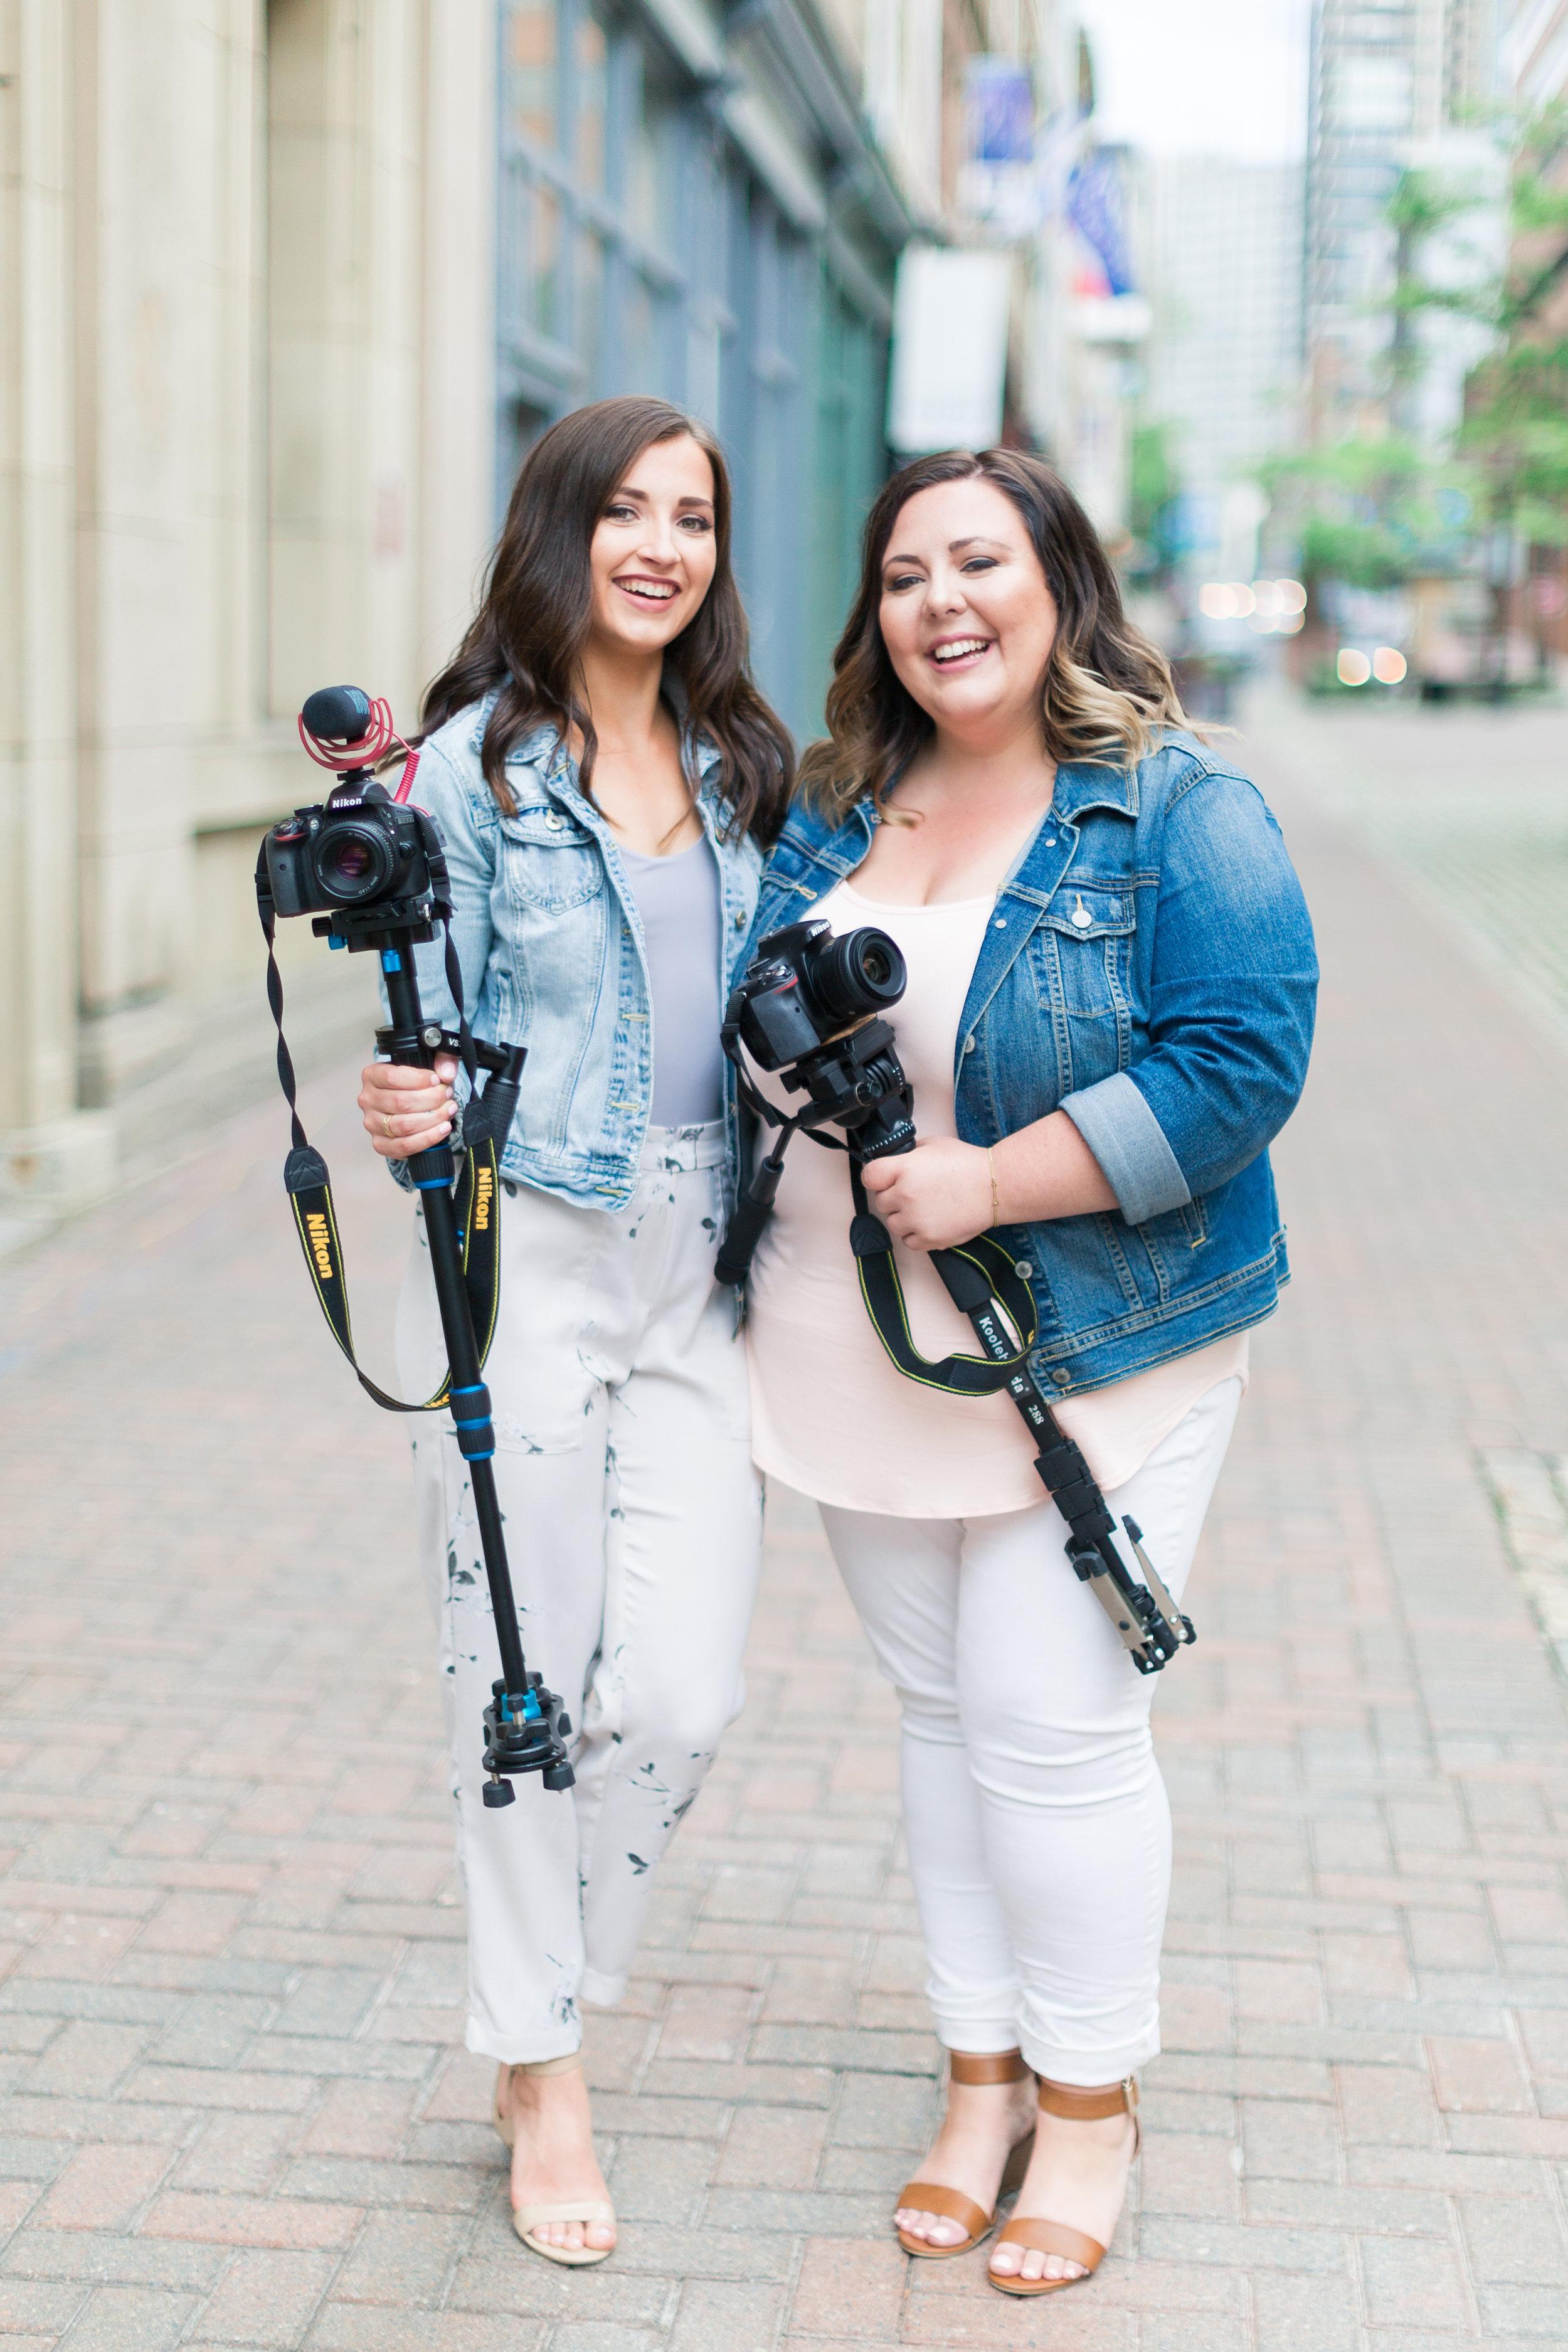 Terri-Lynn Warren Photography - Halifax Wedding and Portrait Photographers-7652.jpg